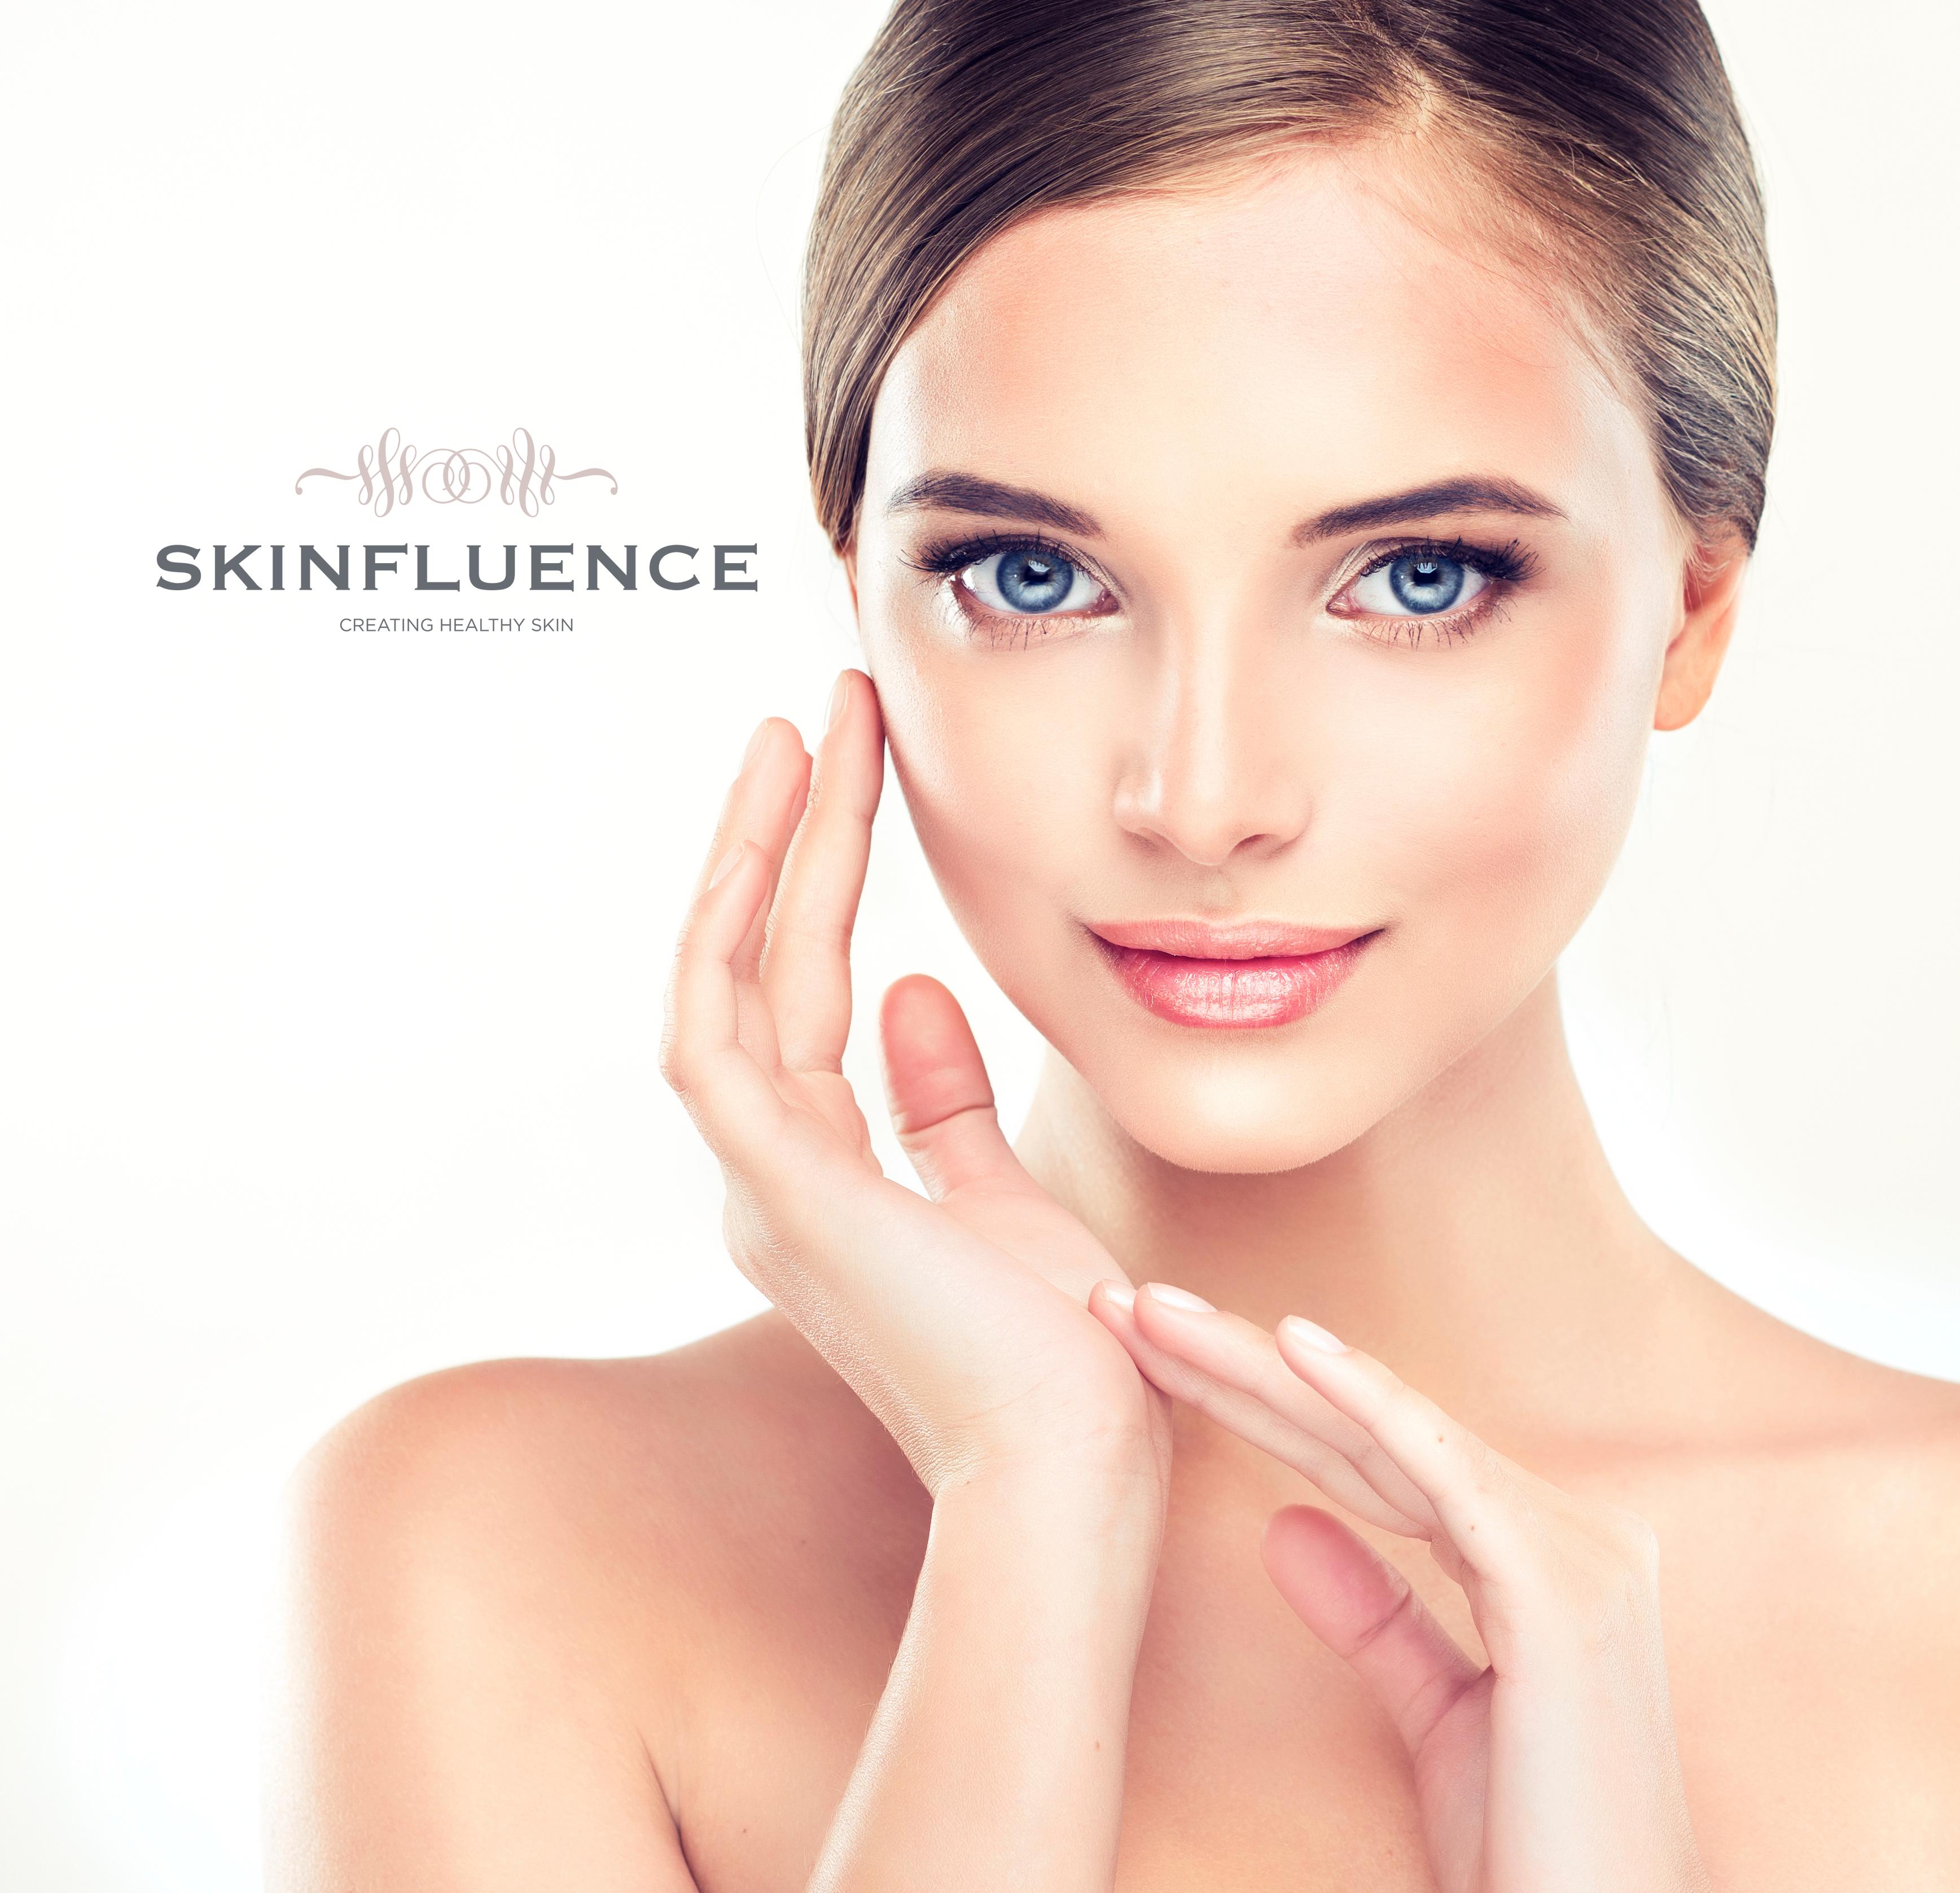 Skinfluence